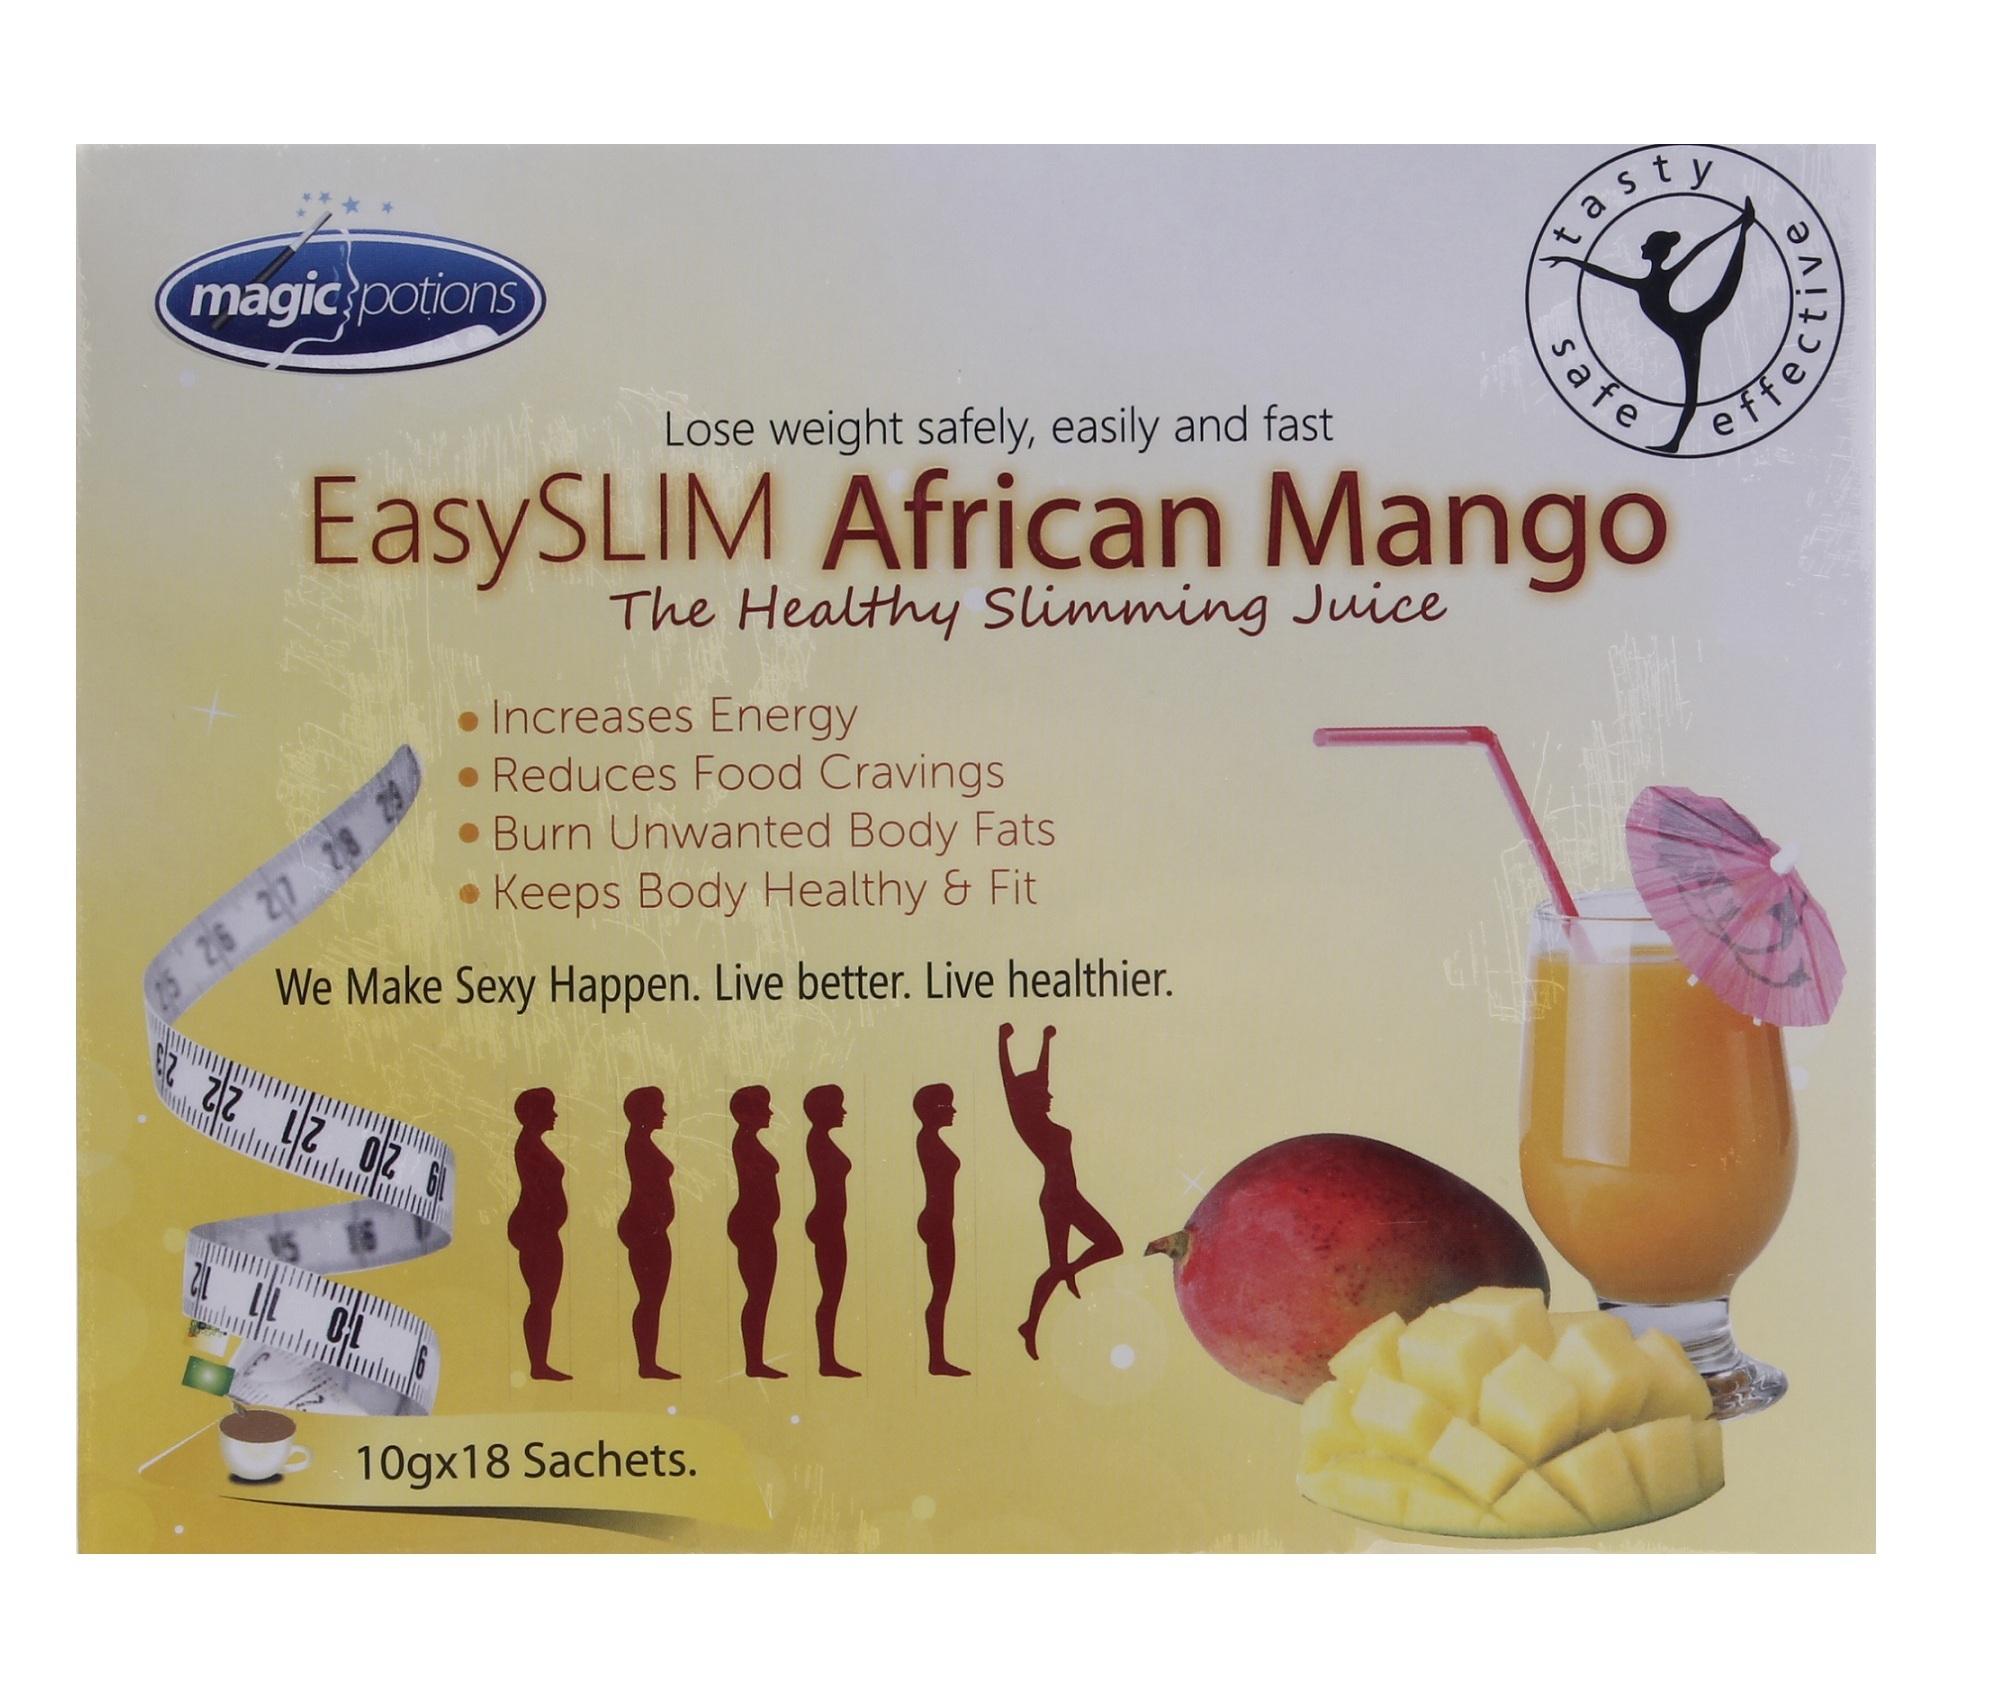 Easyslim African Mango Slimming Juice 10g Sachet, Box of 18